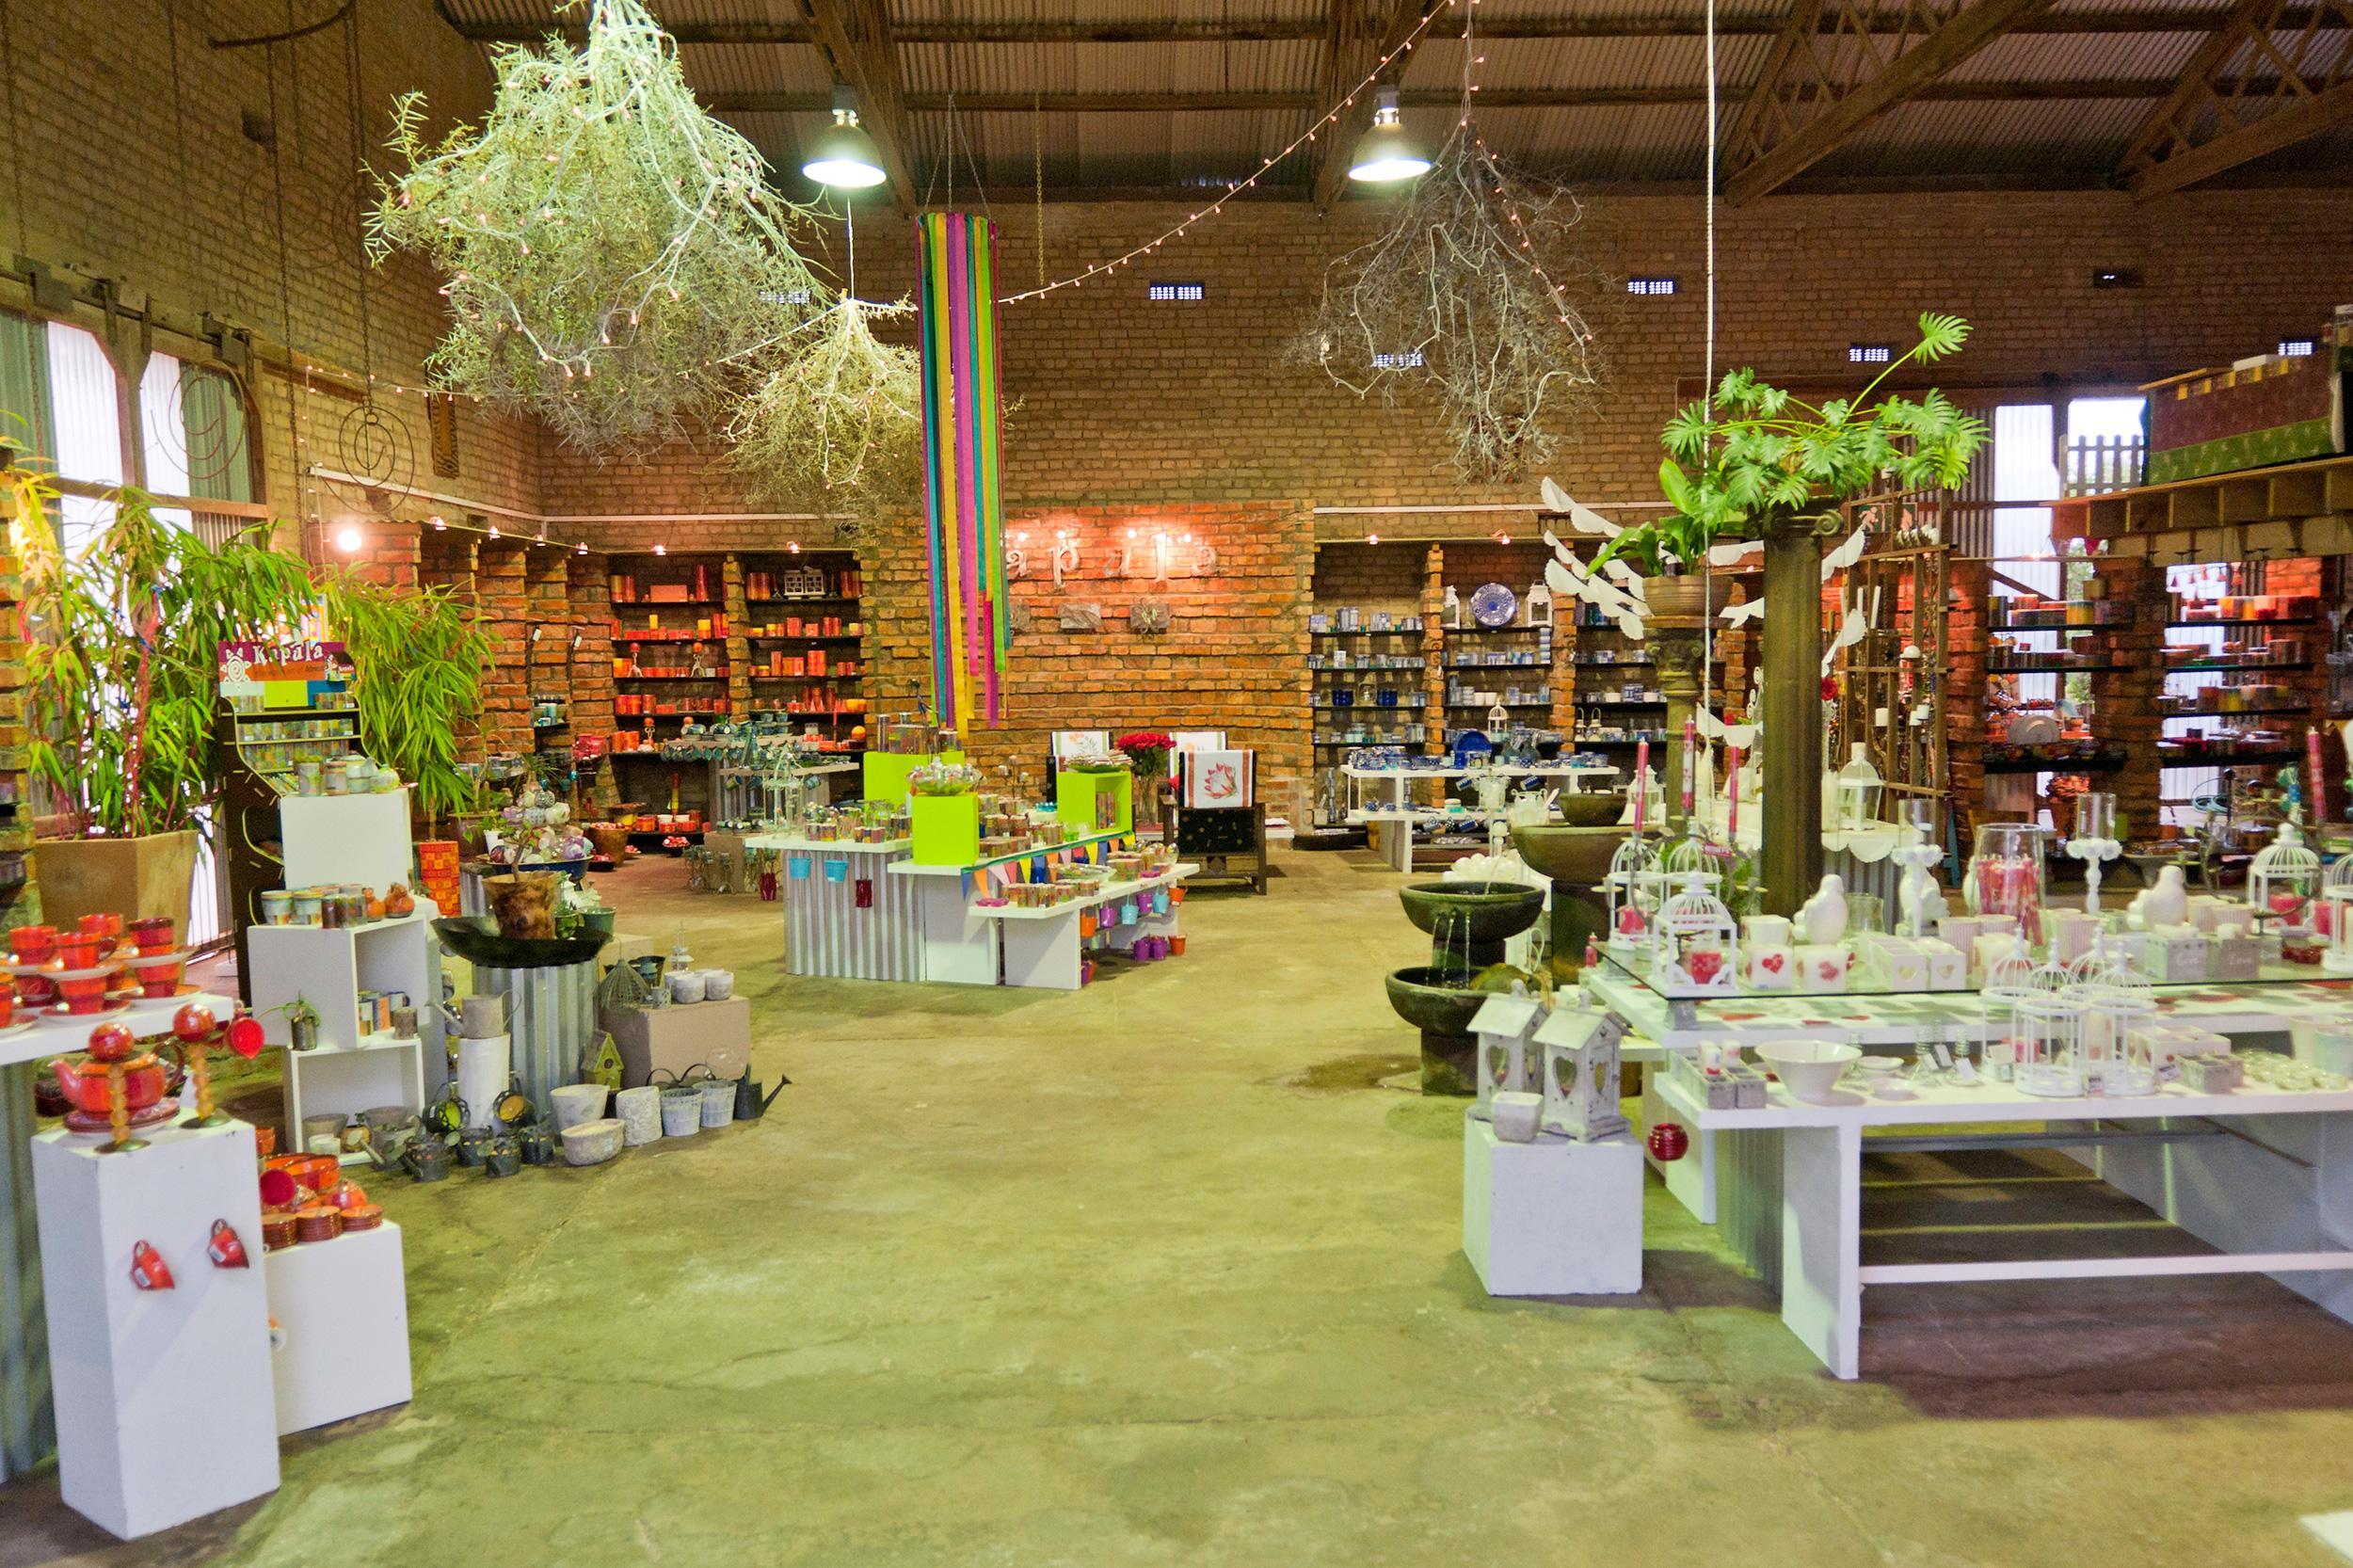 kapula-handmade-candles-ceramics-showroom-shop-south-africa.jpg